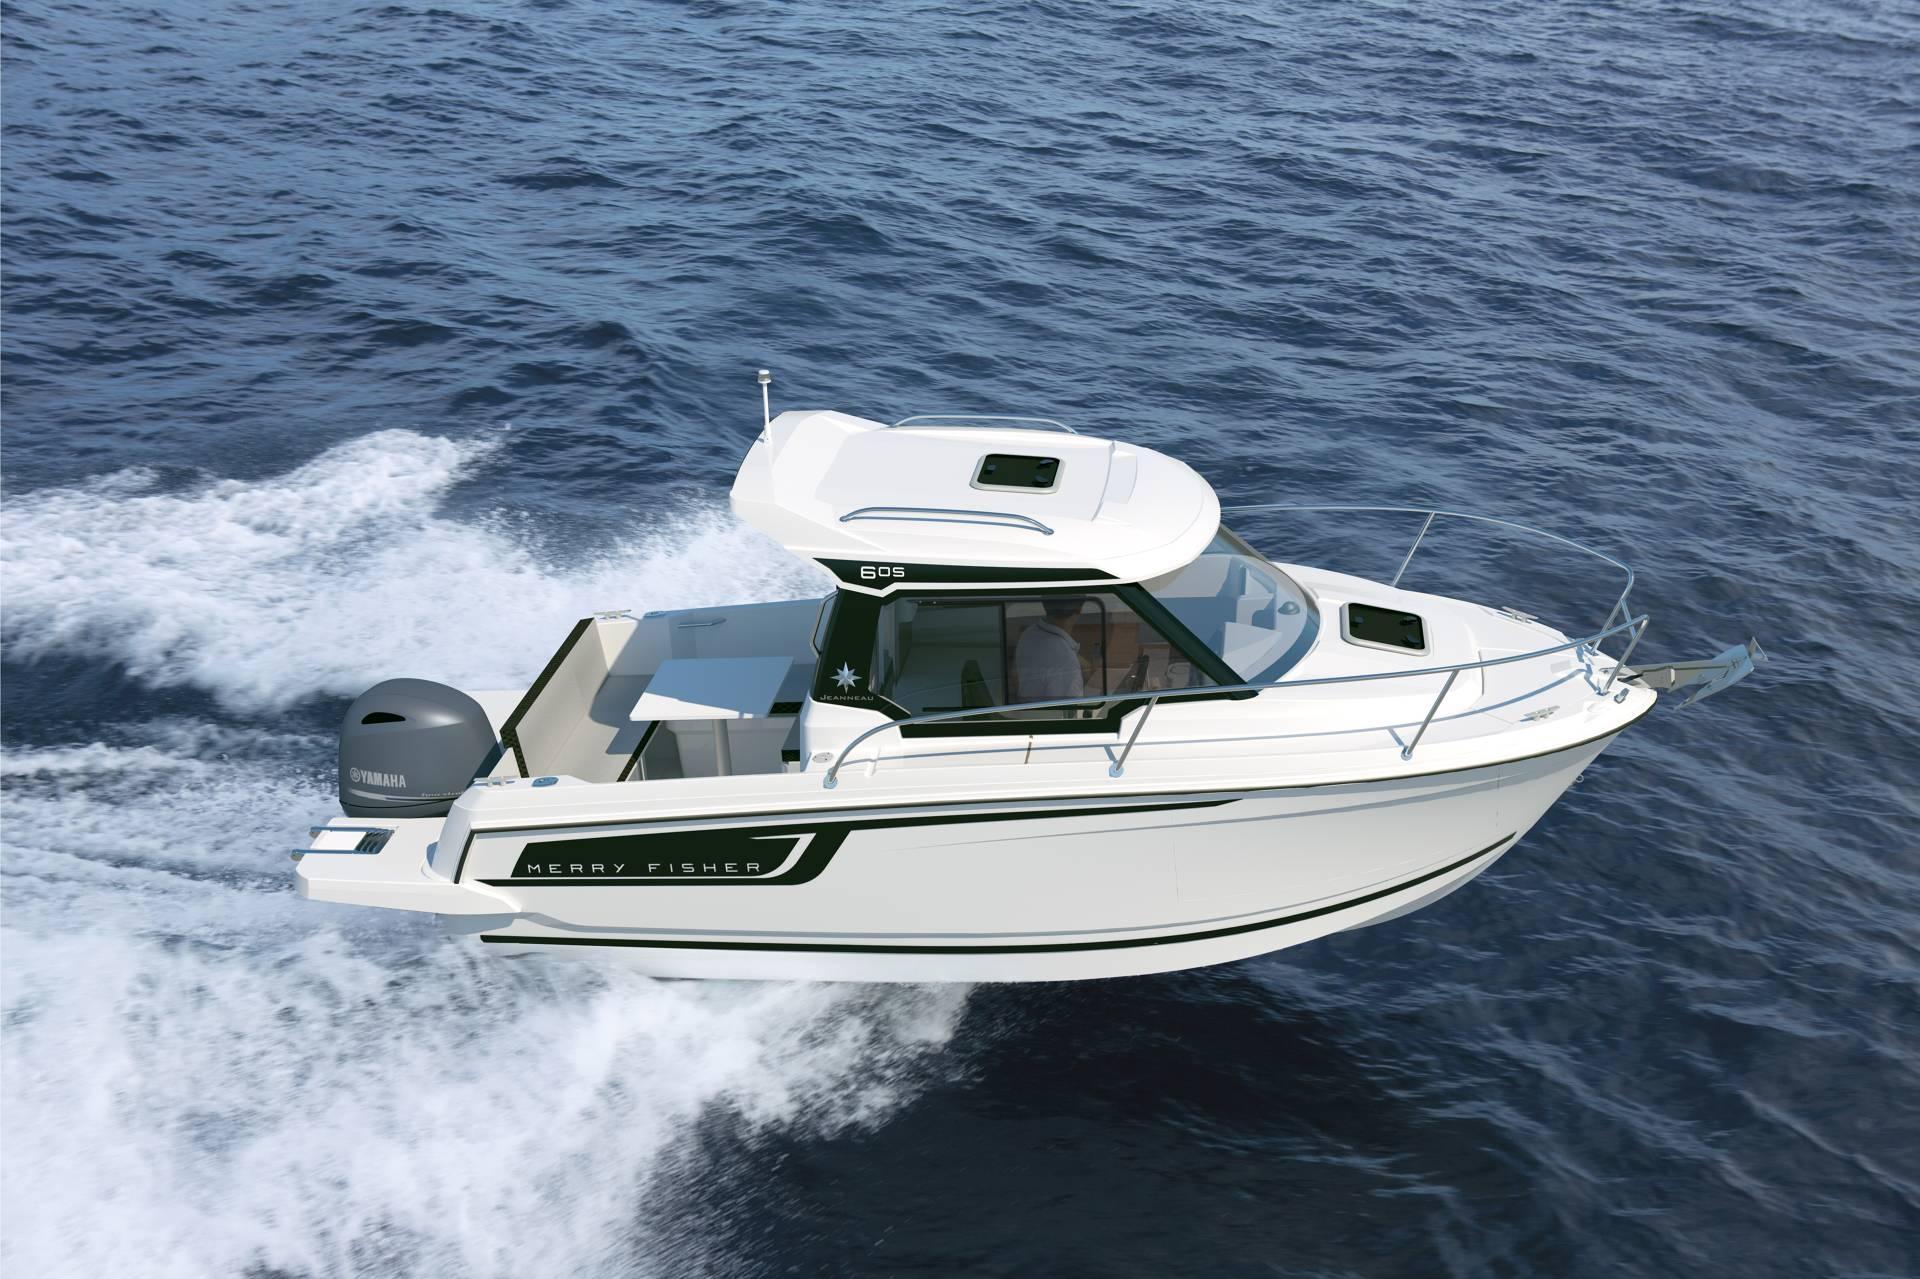 merry-fisher-605-serie2-bateau-moteur-in-board-Jeanneau-bateau-a-Marseille-yatch-mediterranee-1